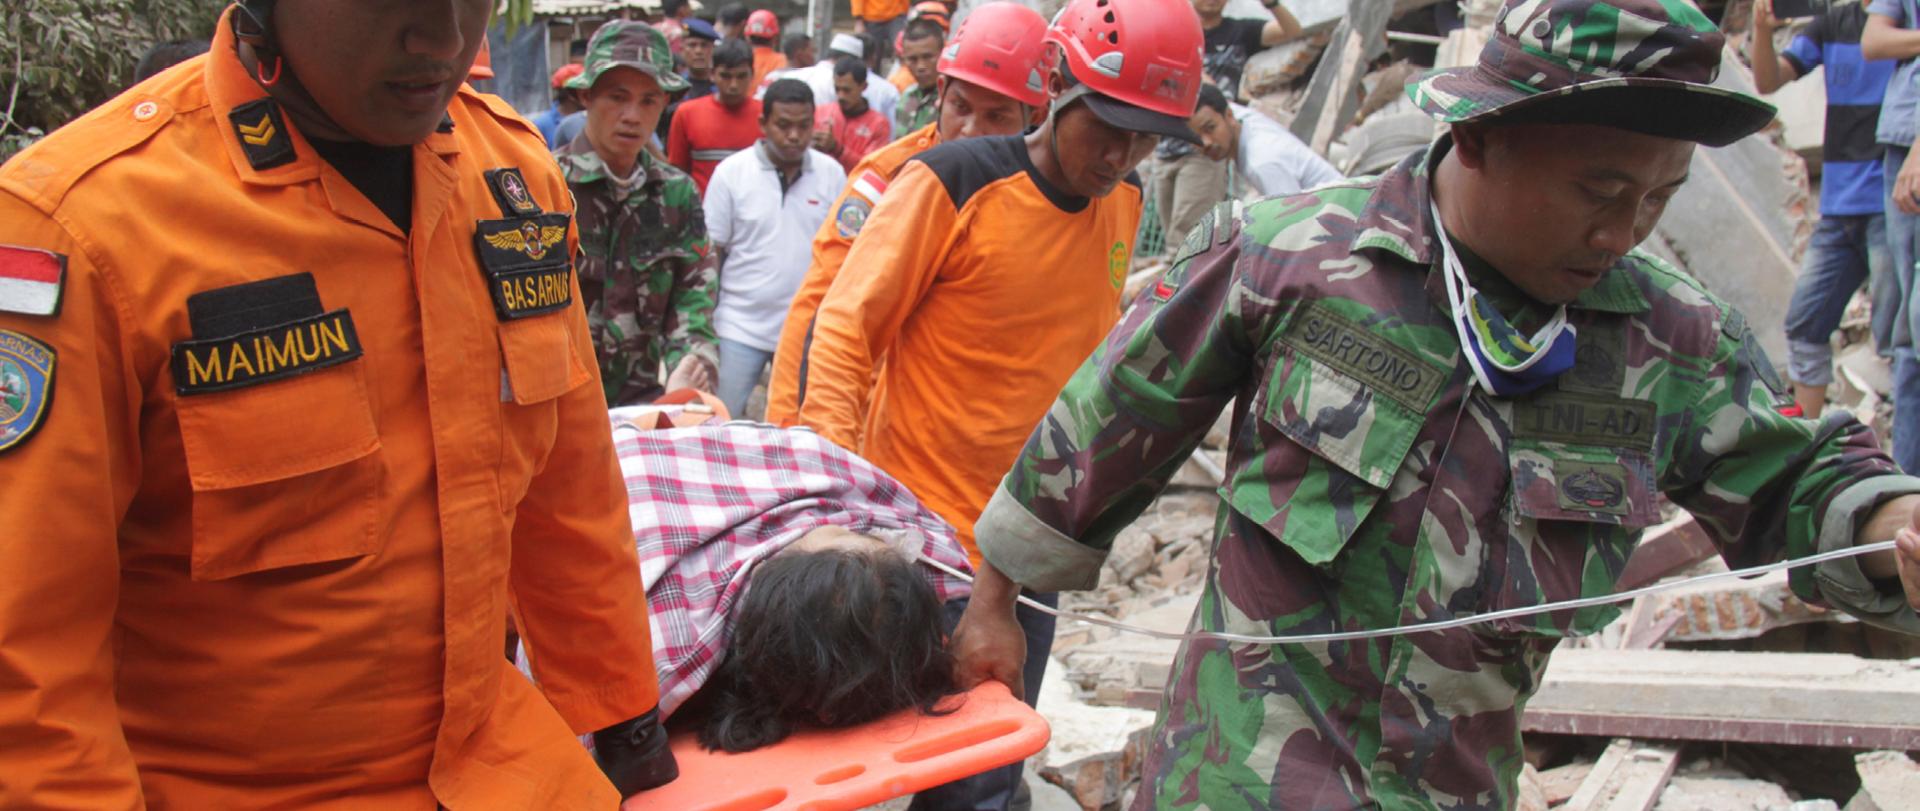 000324_Aceh_Earthquake_Image_Slider_20161208_1200x628